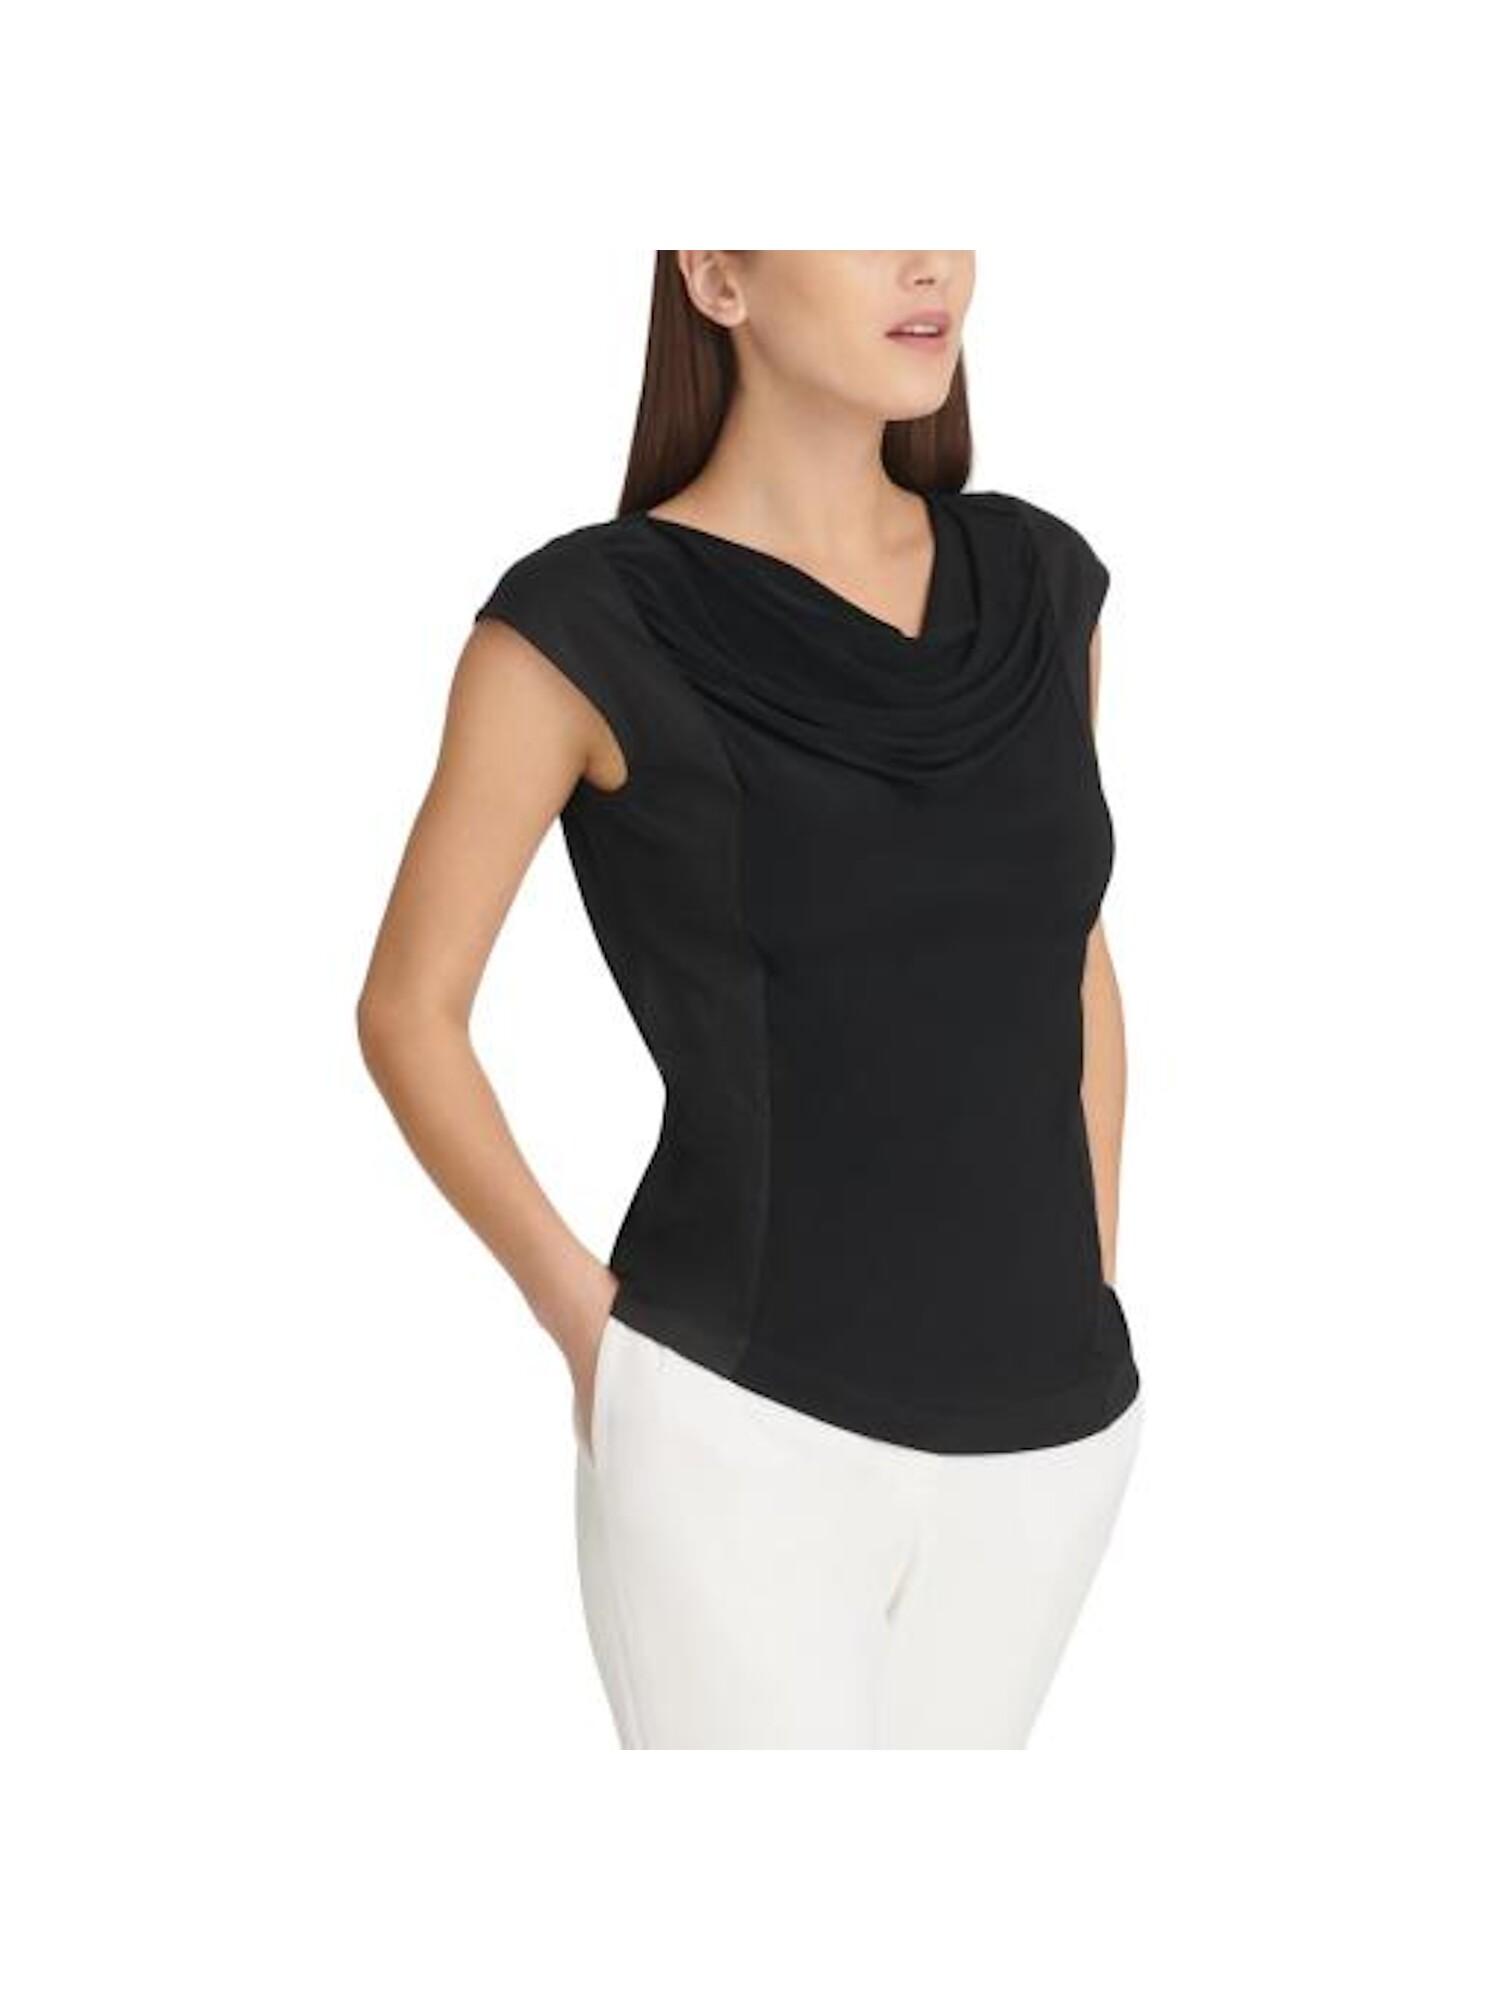 DKNY NEW Women/'s Printed V-veck Long Sleeve Blouse Shirt Top TEDO